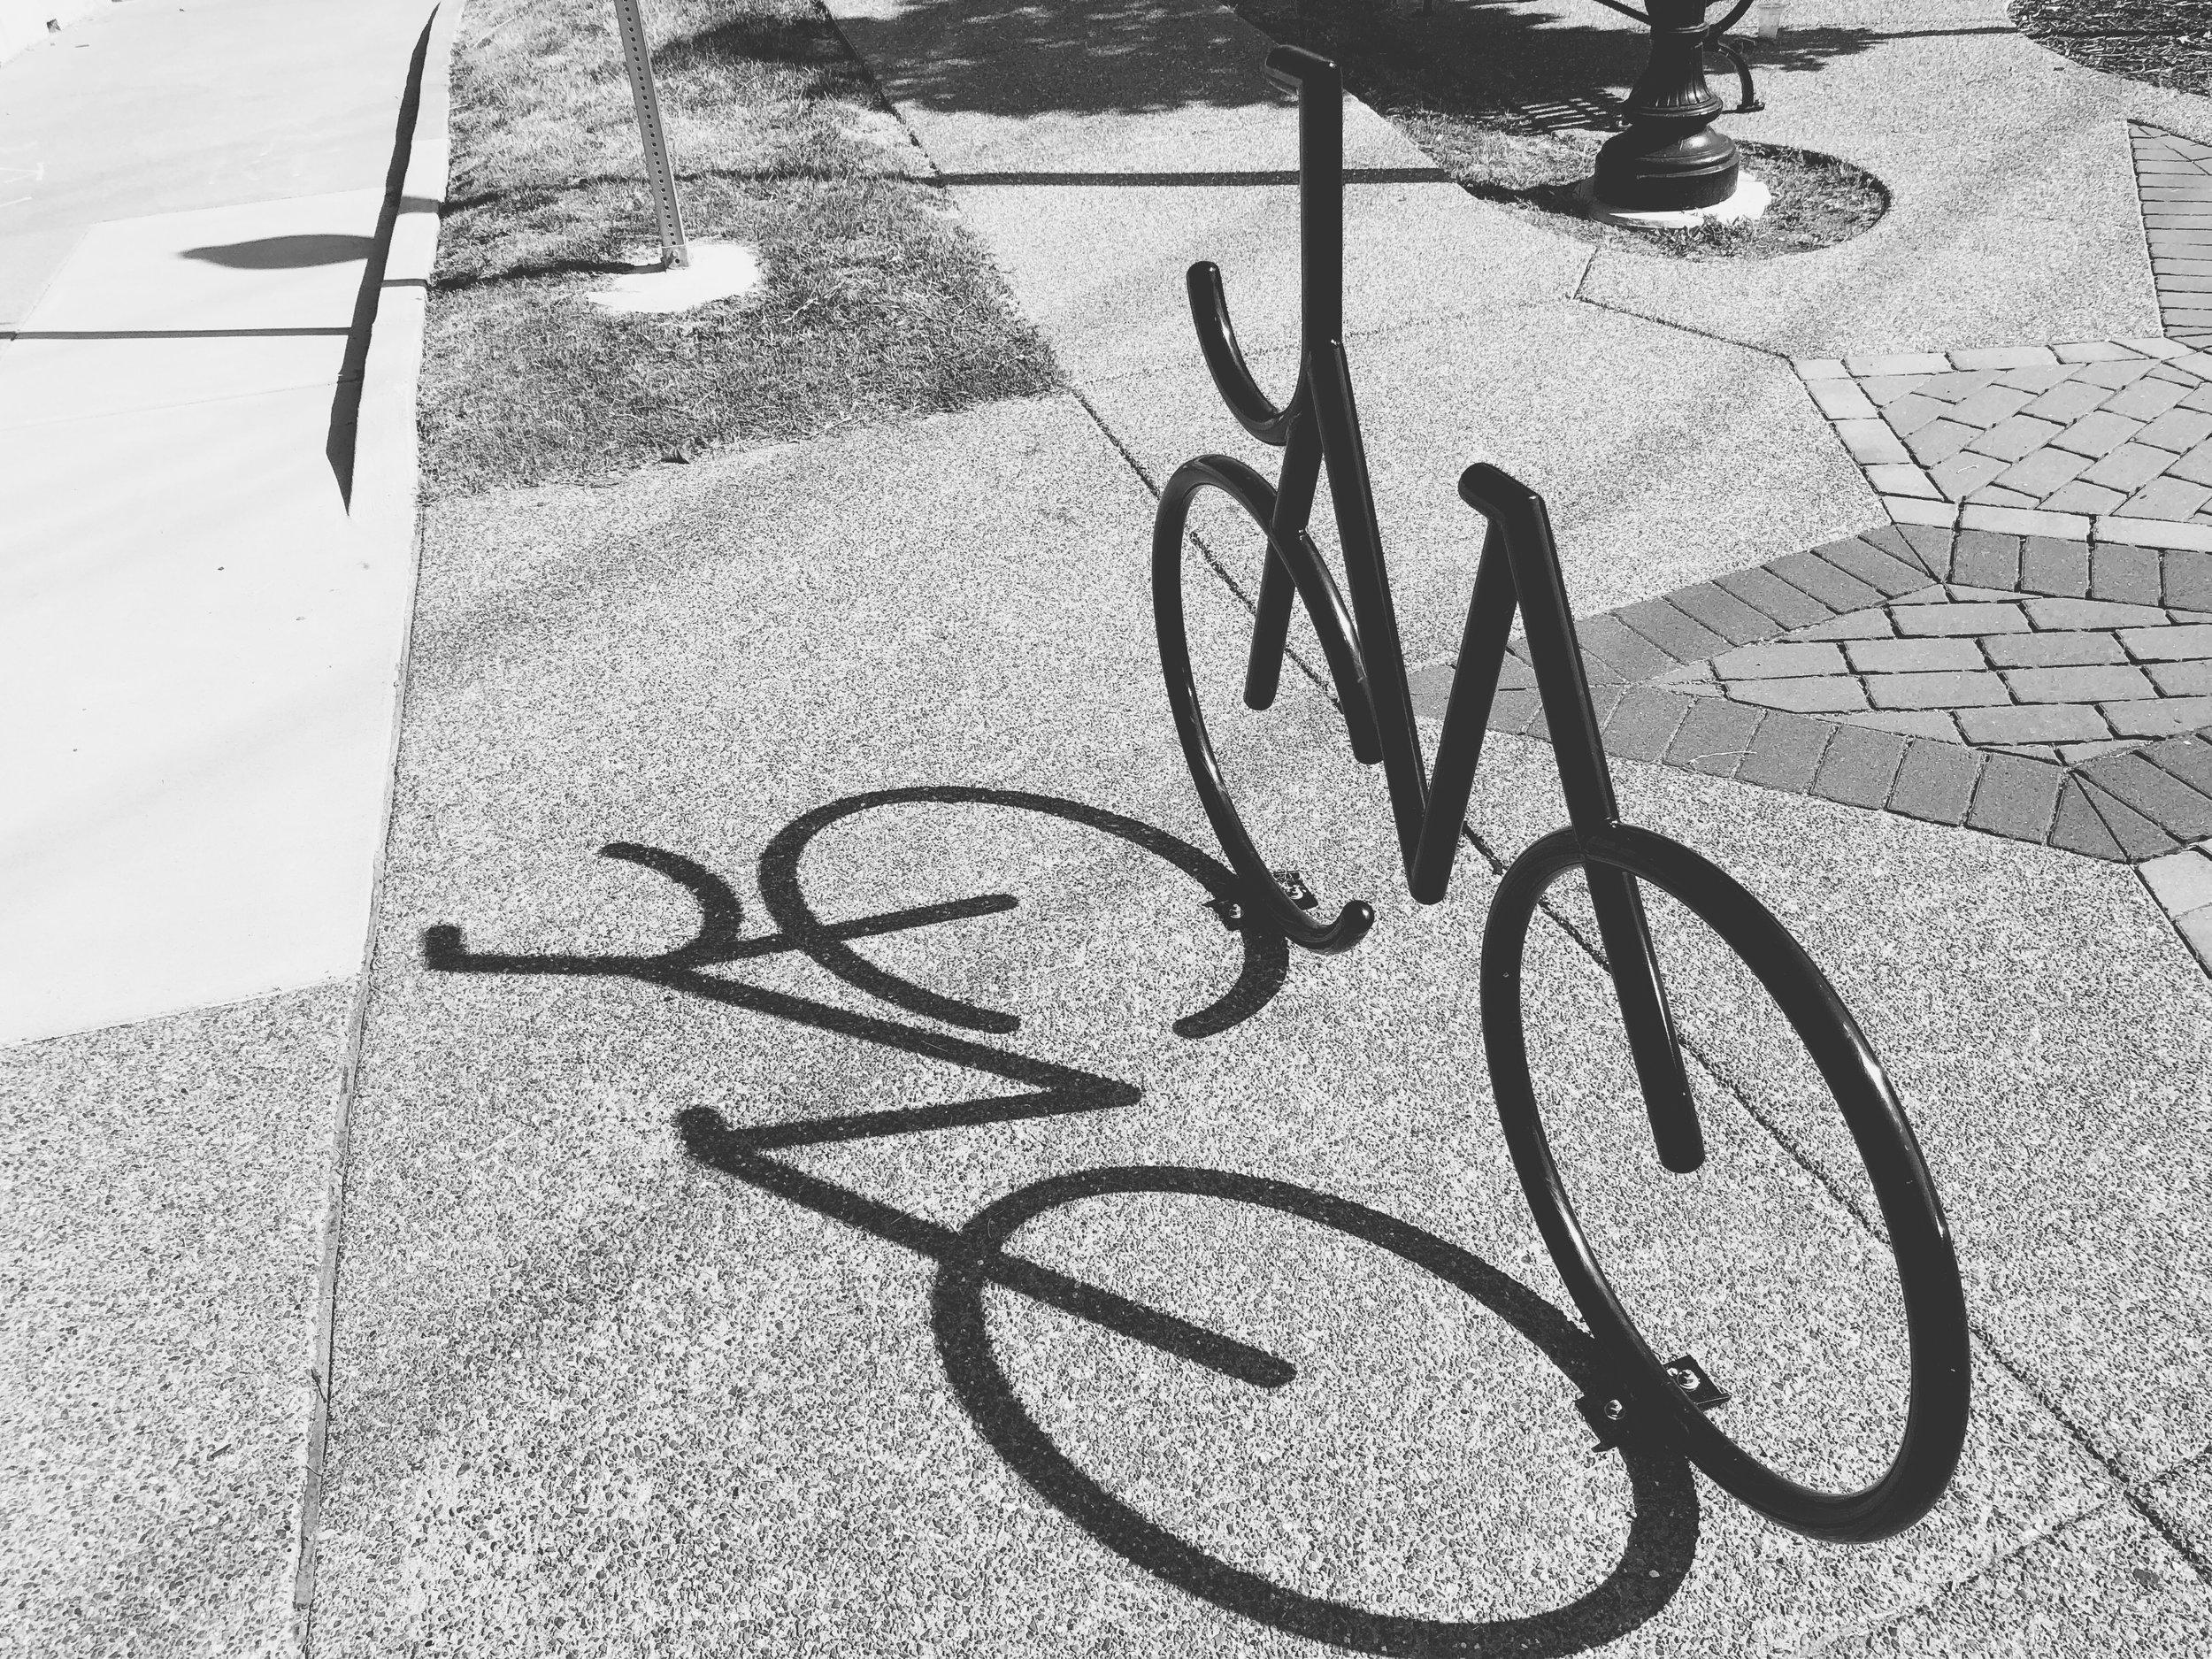 jcmo-bike-racks-biking-jefferson-city-mo